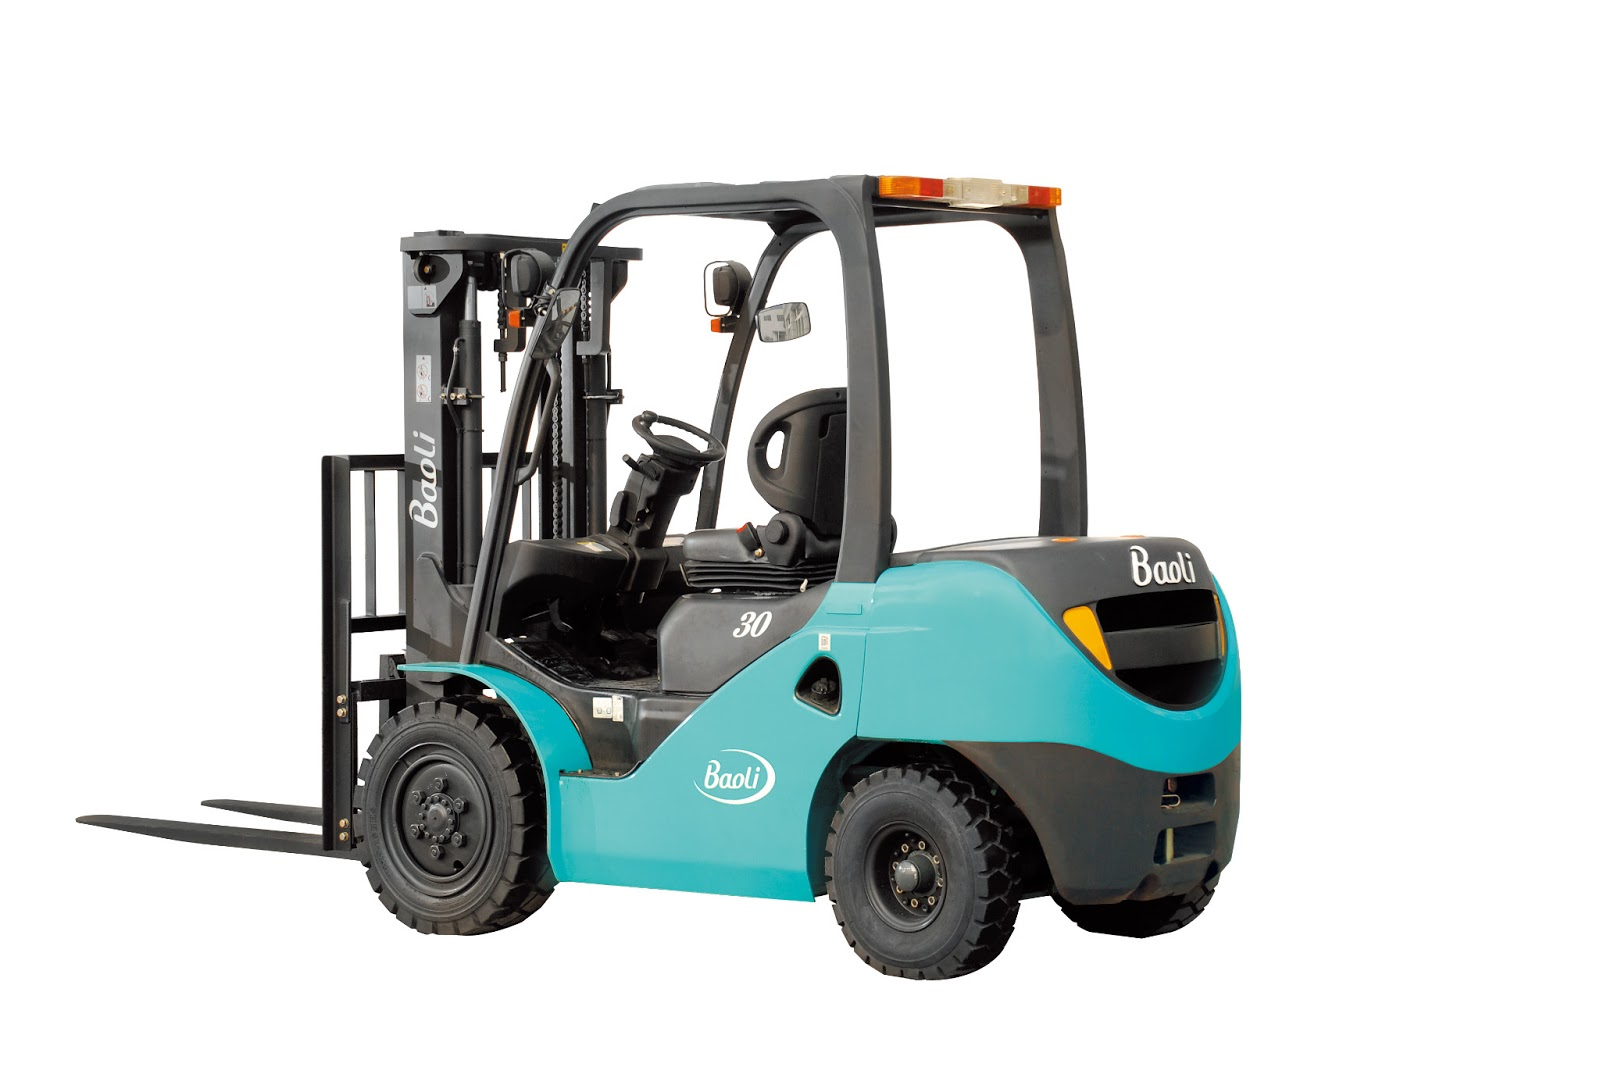 Forklift China Kion Baoli Type